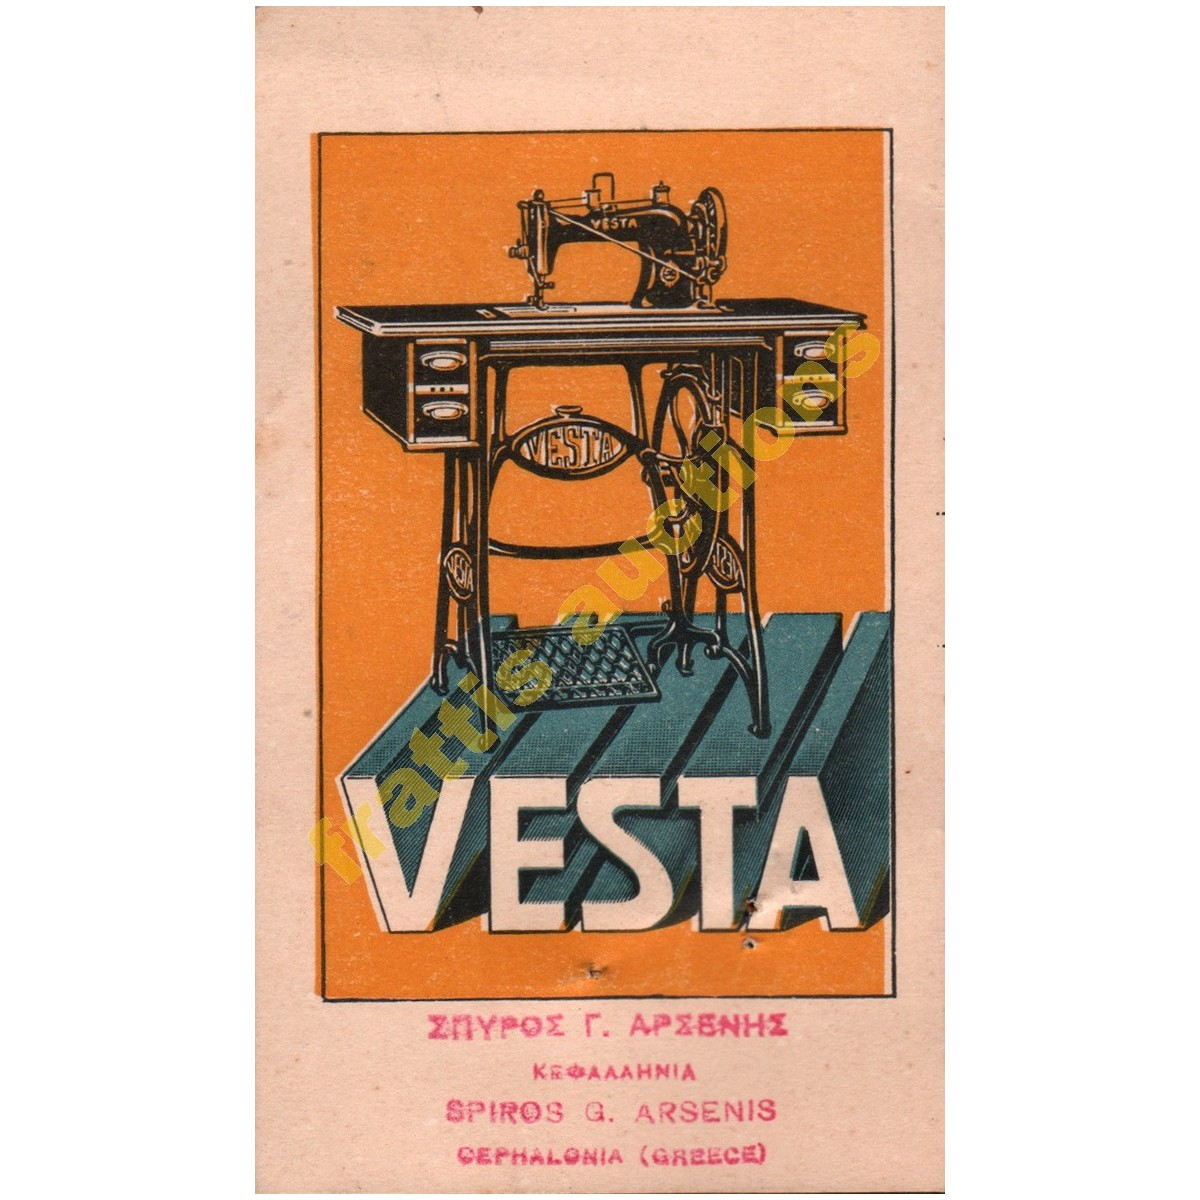 VESTA, διαφημιστική κάρτα.